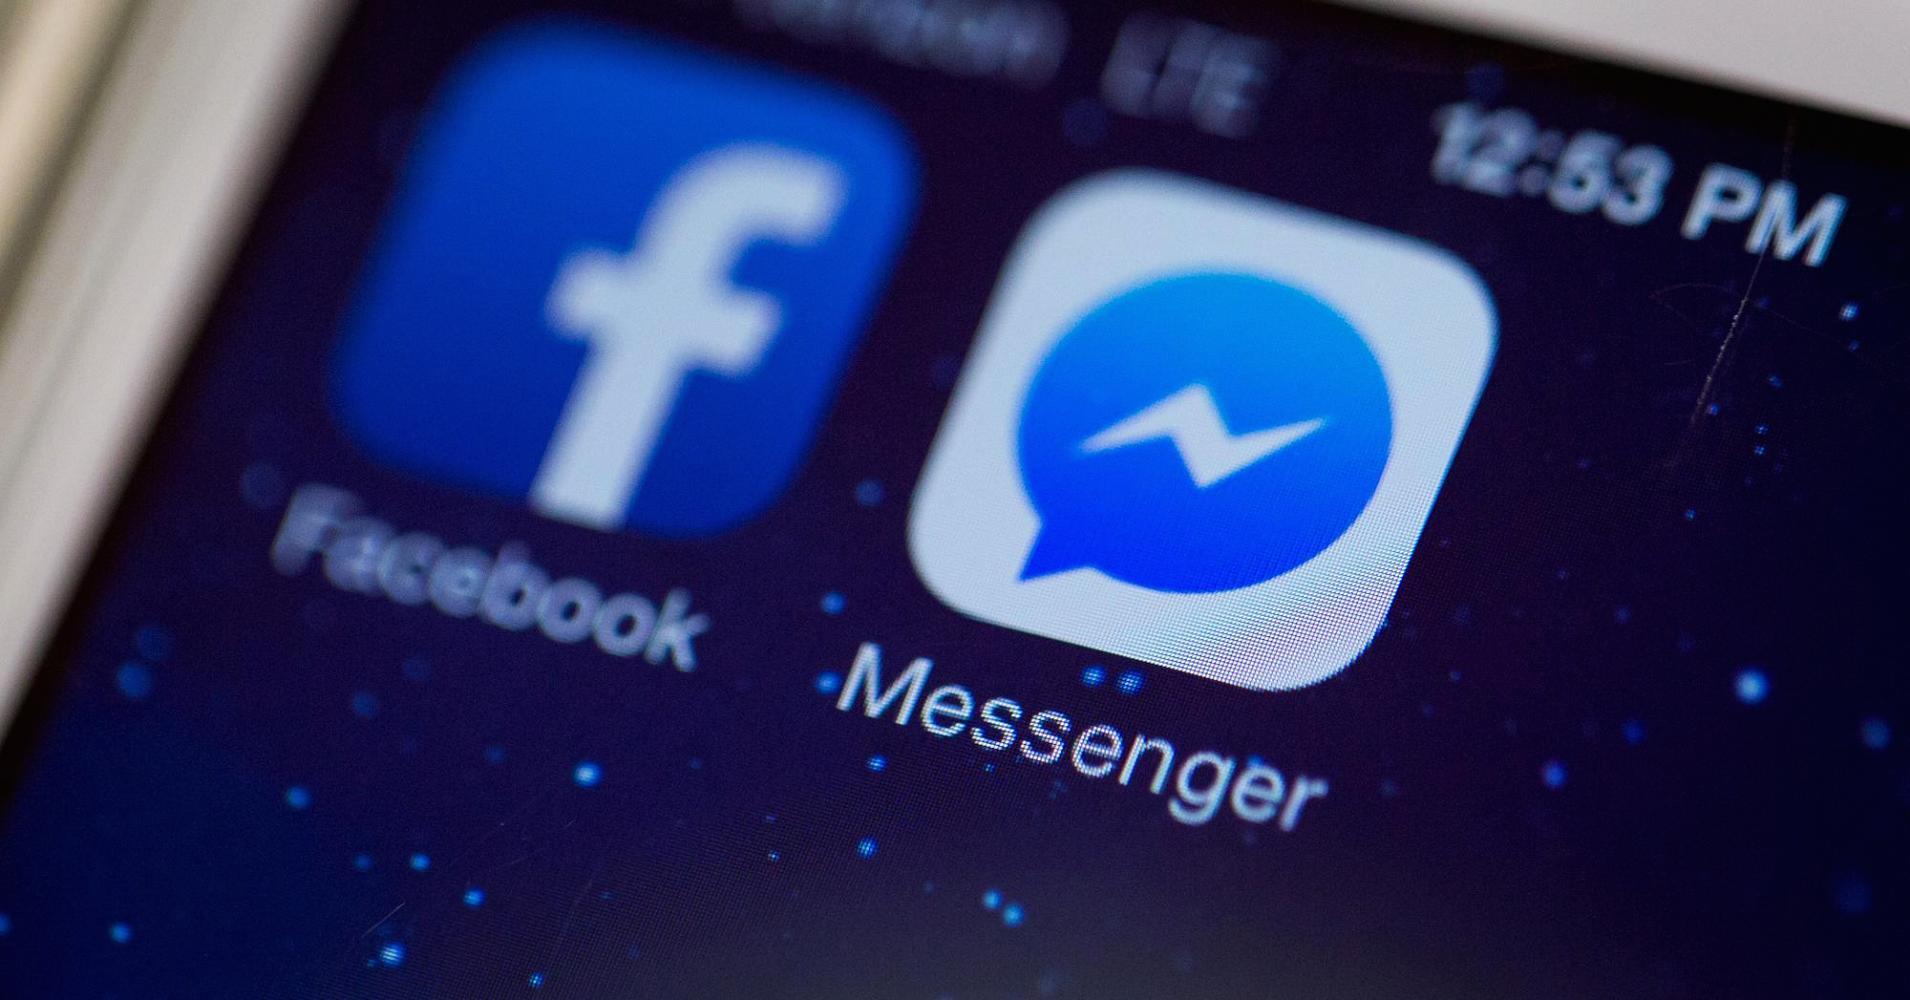 Installa Facebook Messenger per dispositivi mobili gratuitamente 3